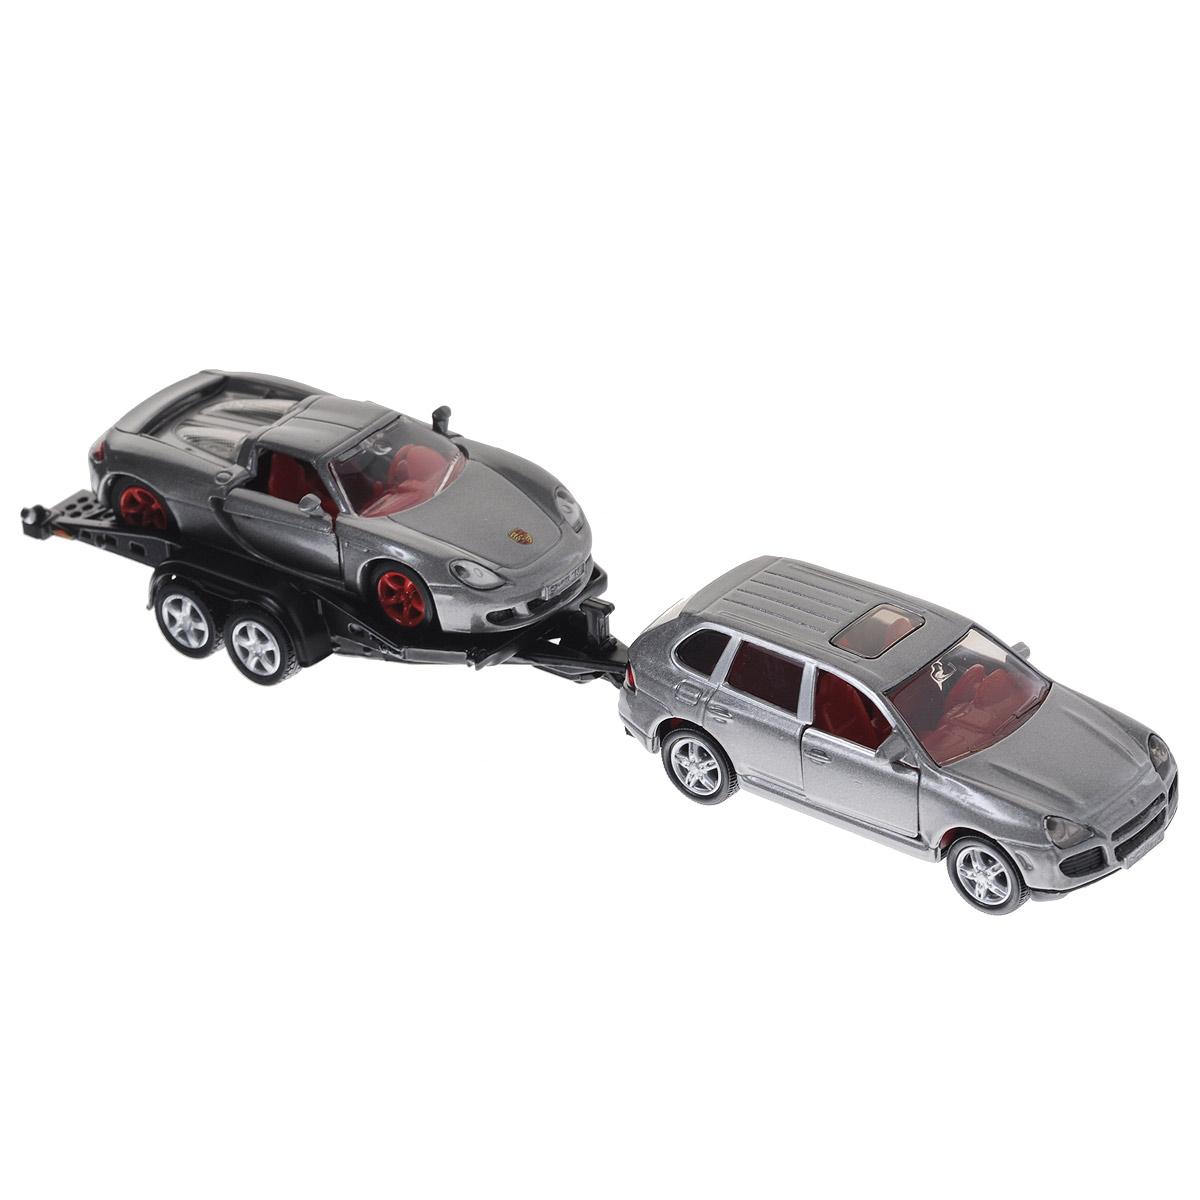 Siku Модель автомобиля Porsche Cayenne Turbo с прицепом и Porsche GT металлическая модель siku прицеп кузов 1965